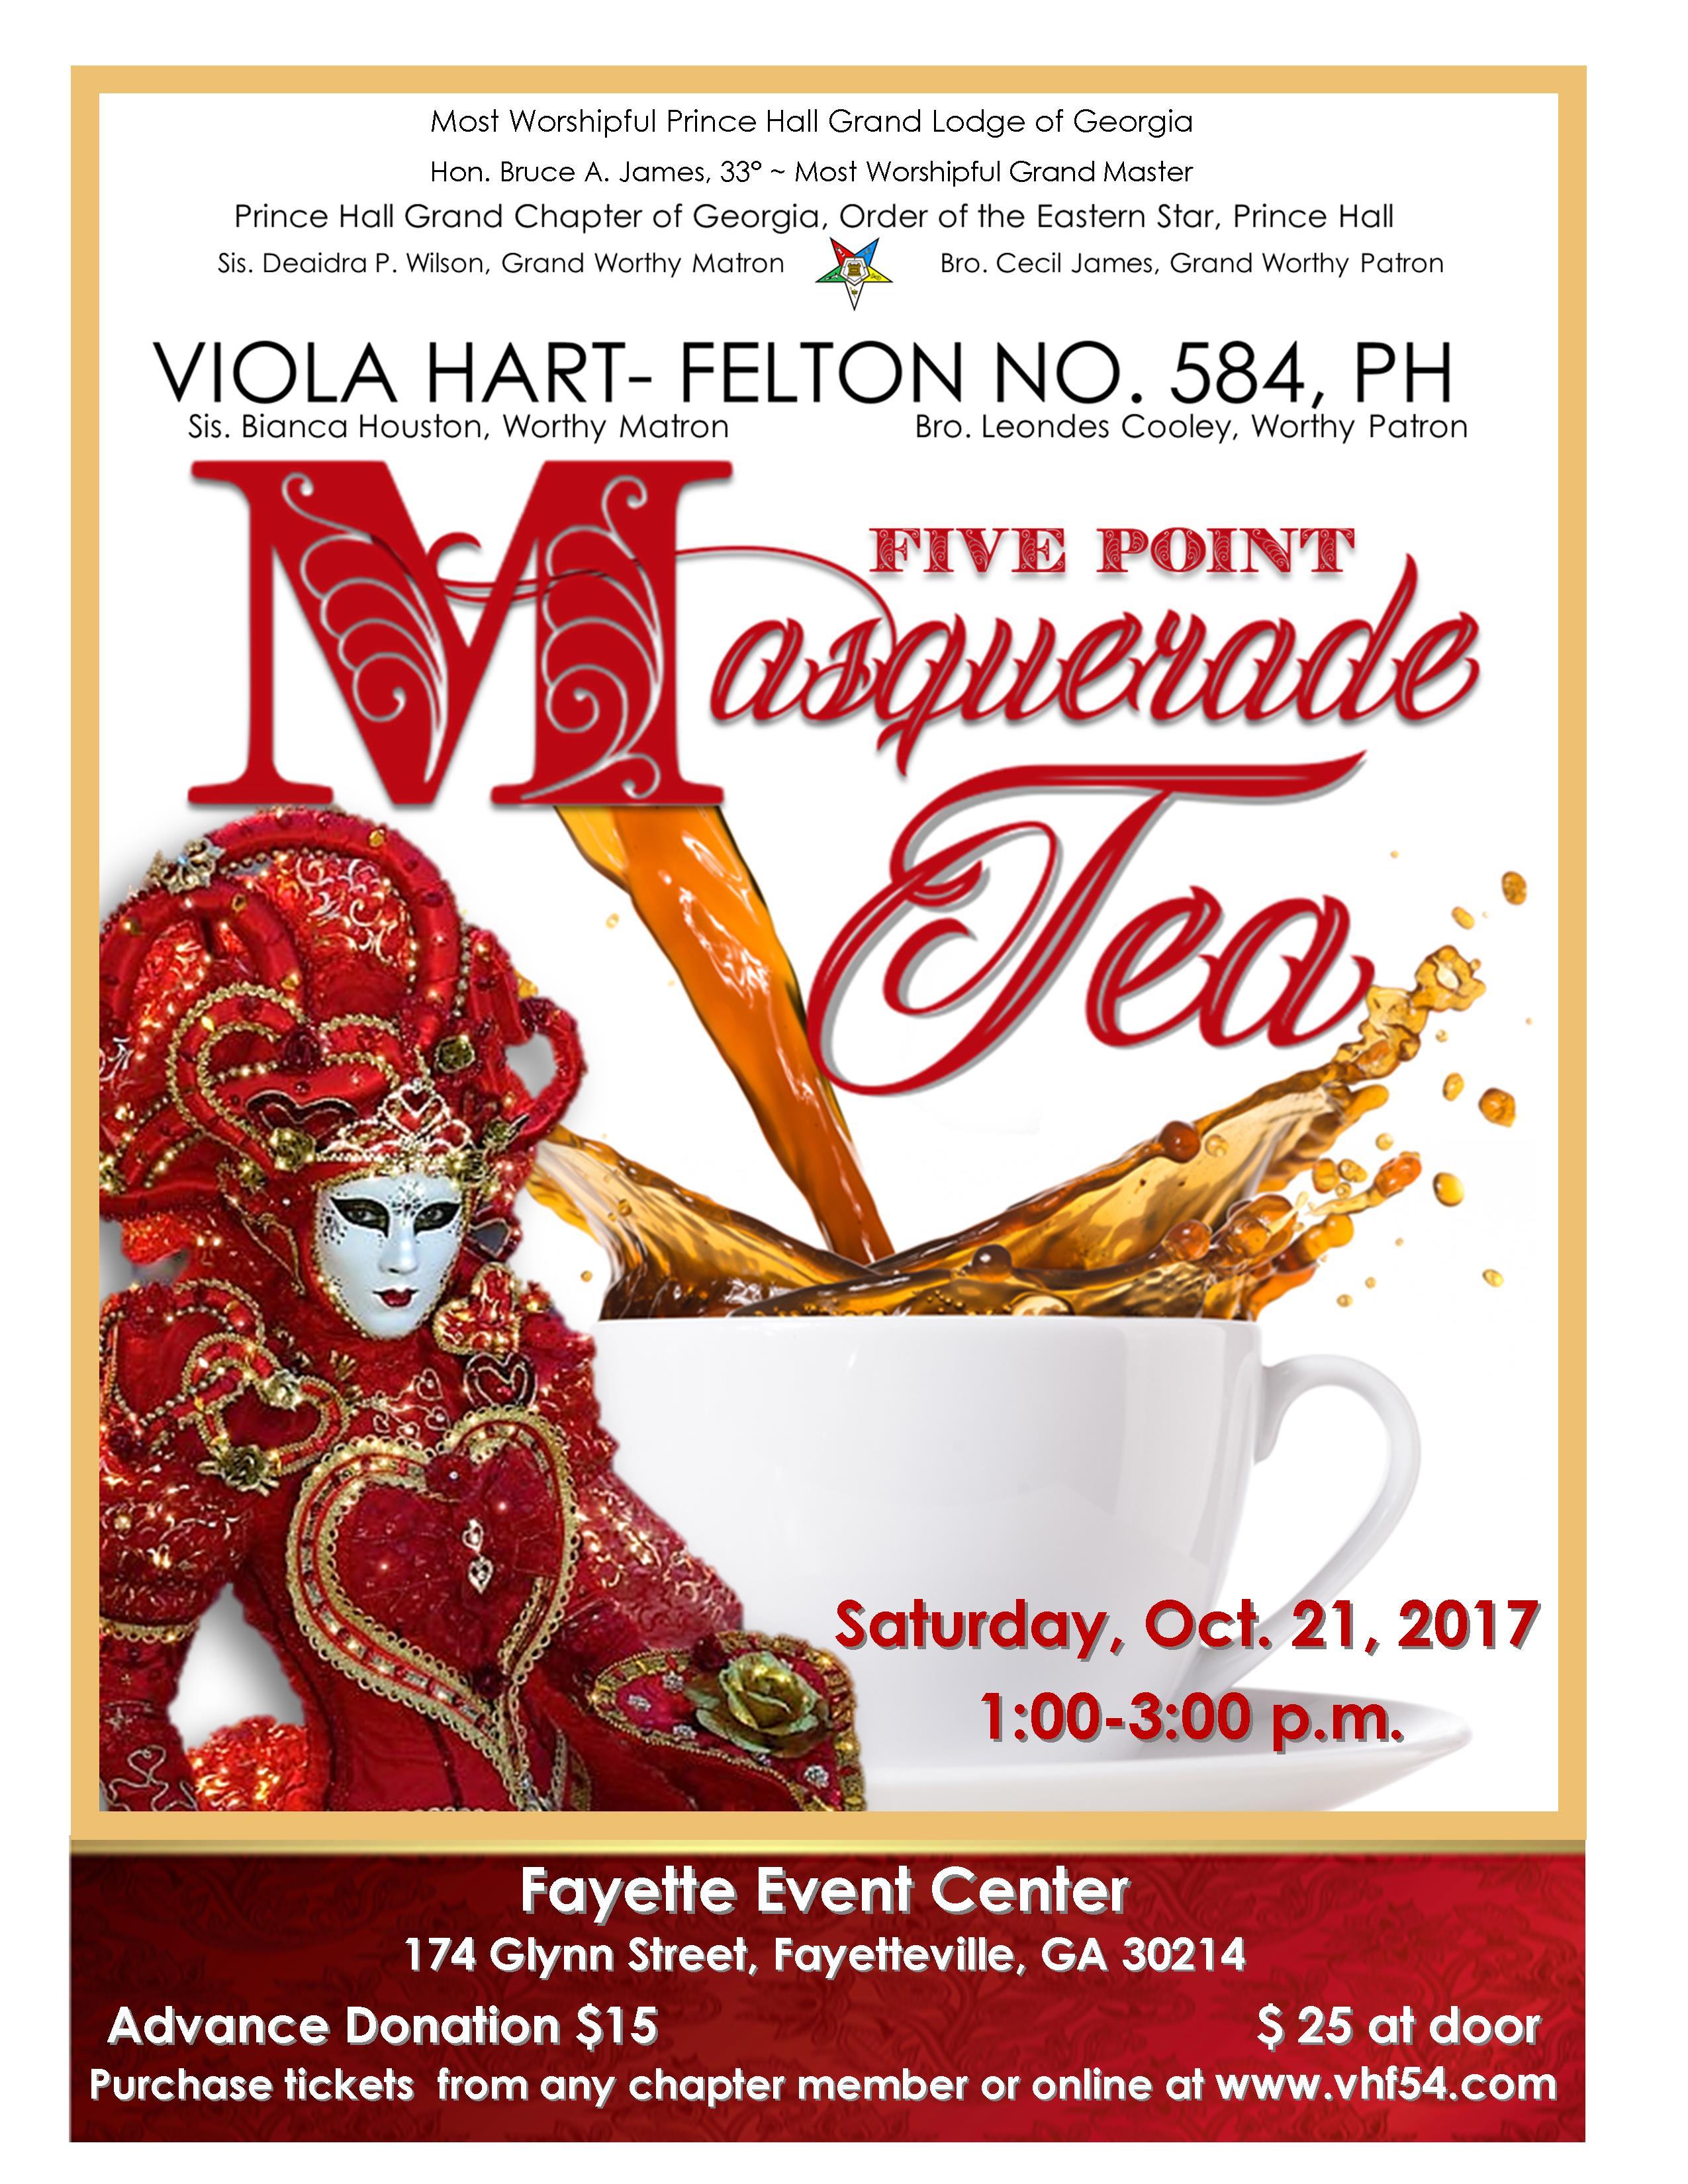 Five Point Masquerade Tea @ Fayette Event Center